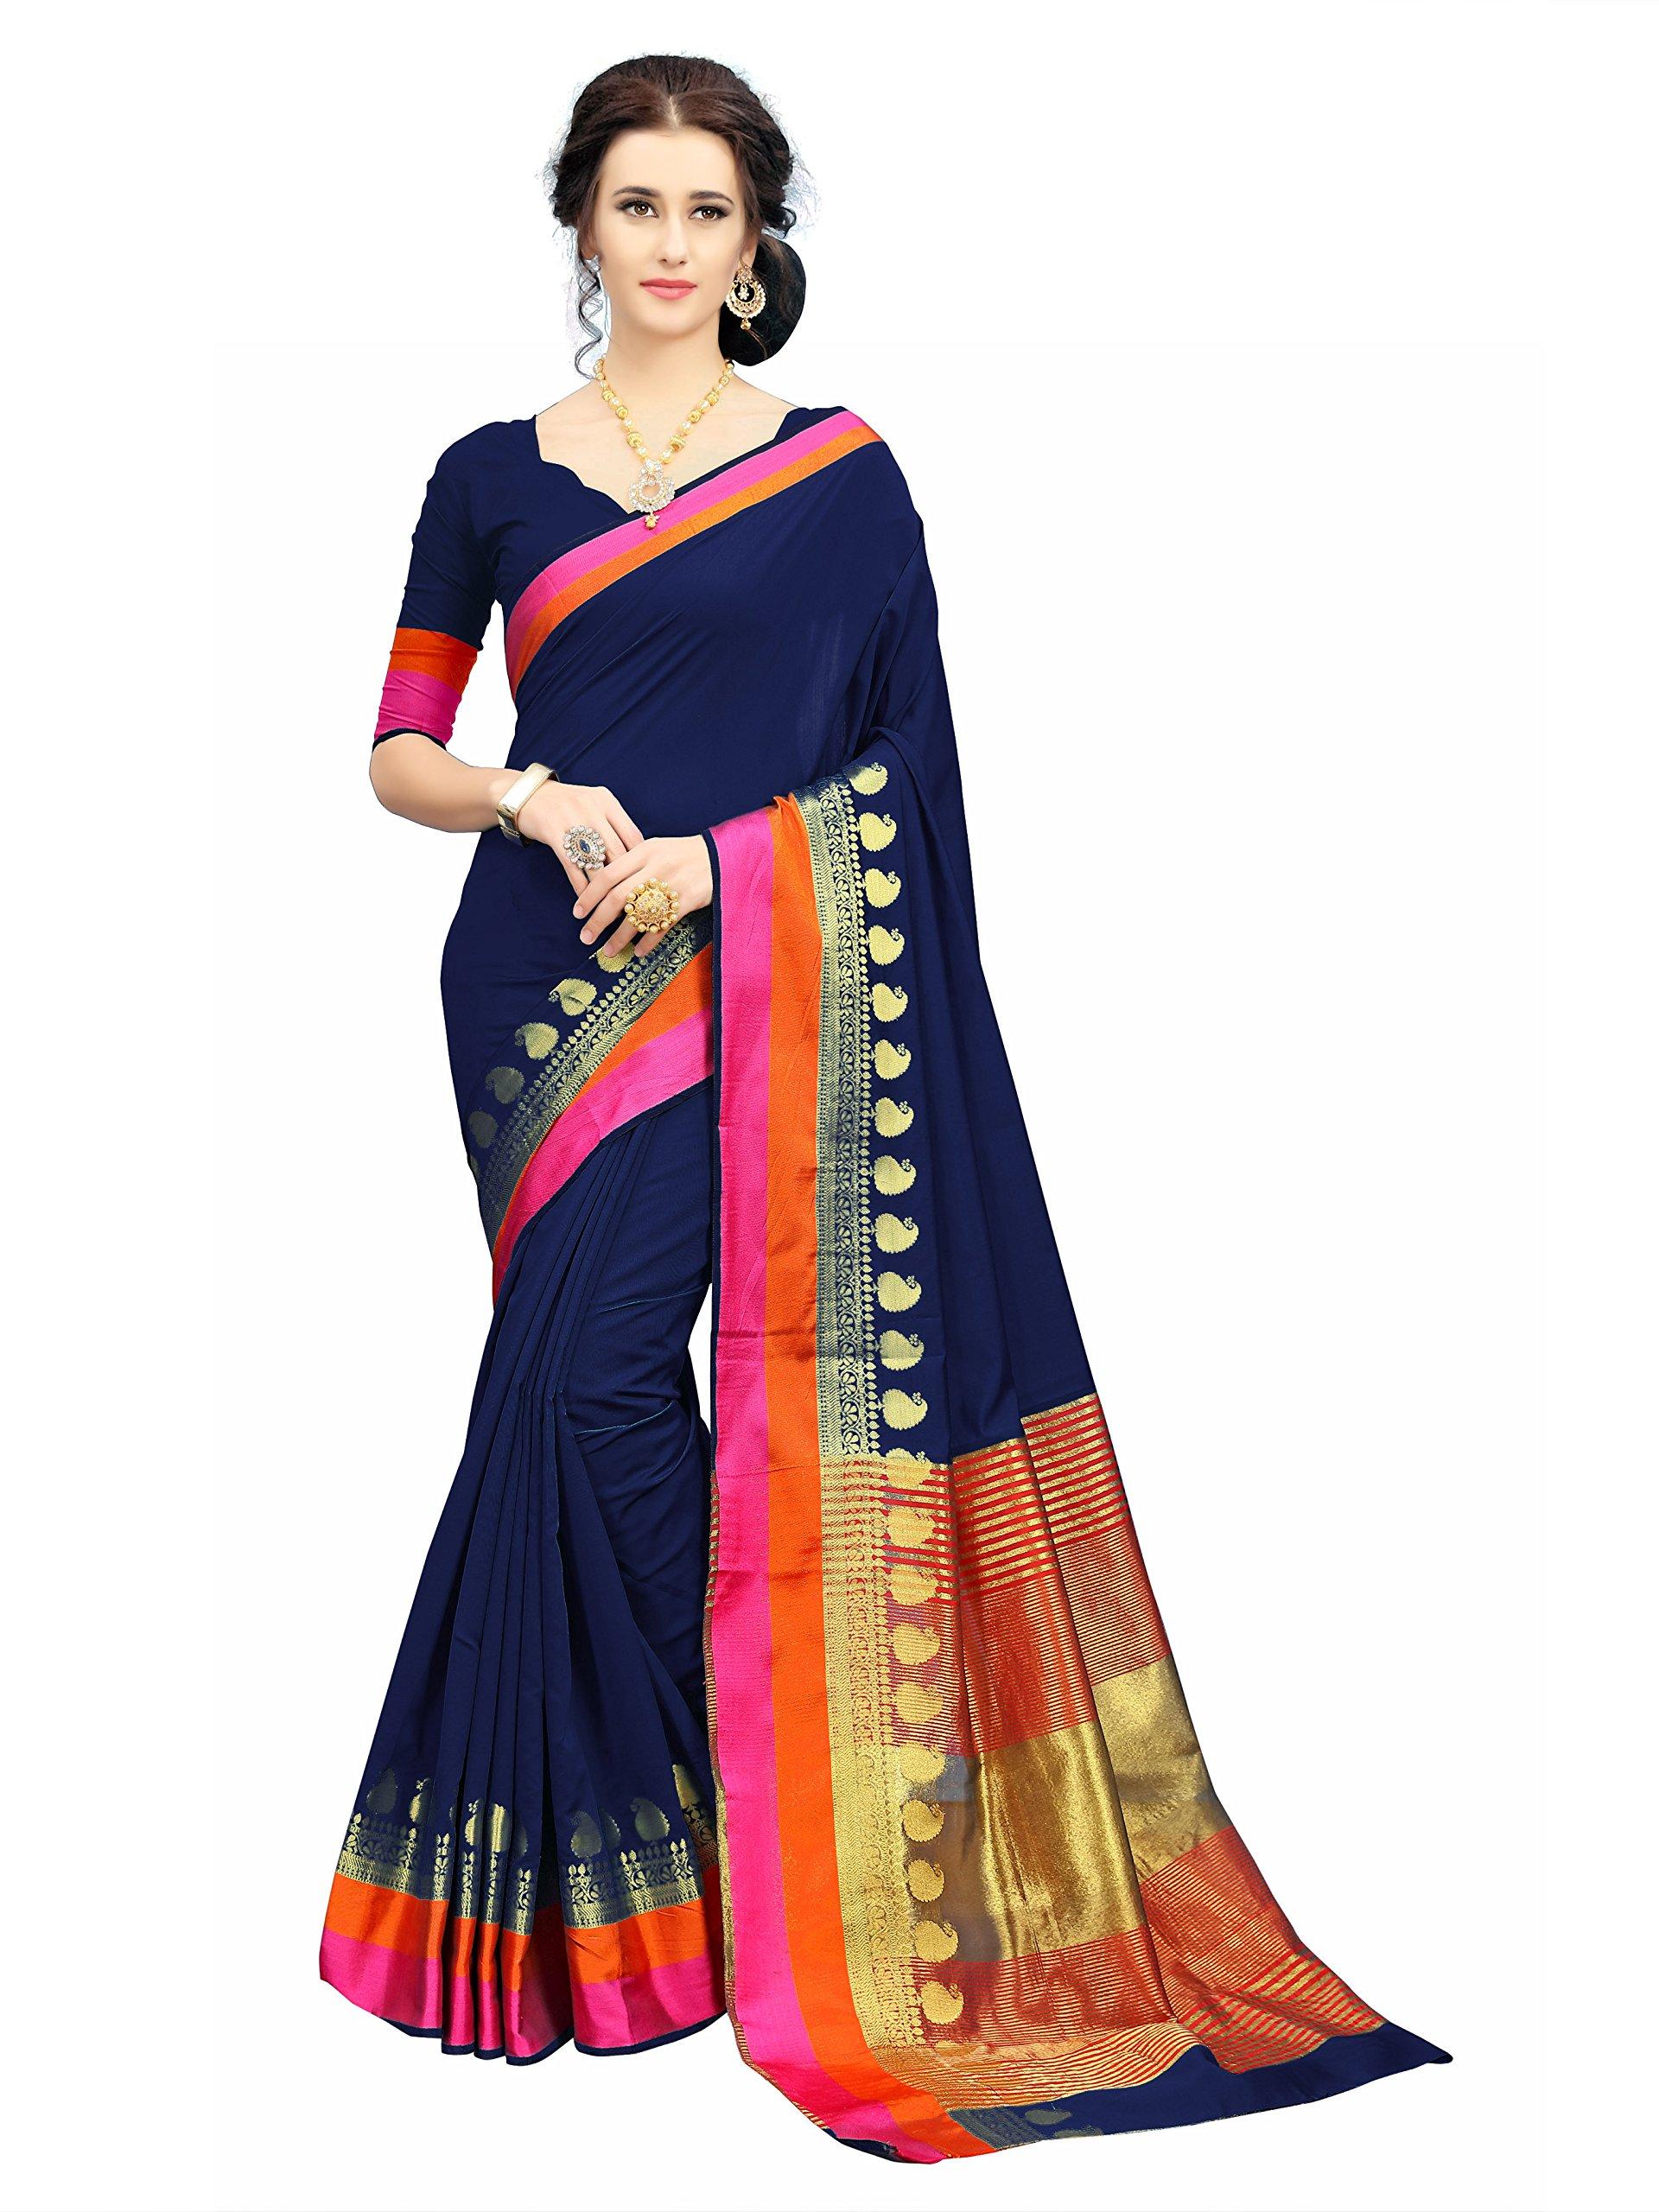 c62c34f469 Soru Fashion Striped Kanjivaram Art Silk, Banarasi Silk, Jacquard Saree  (611_Dark Blue) - Gia Designer